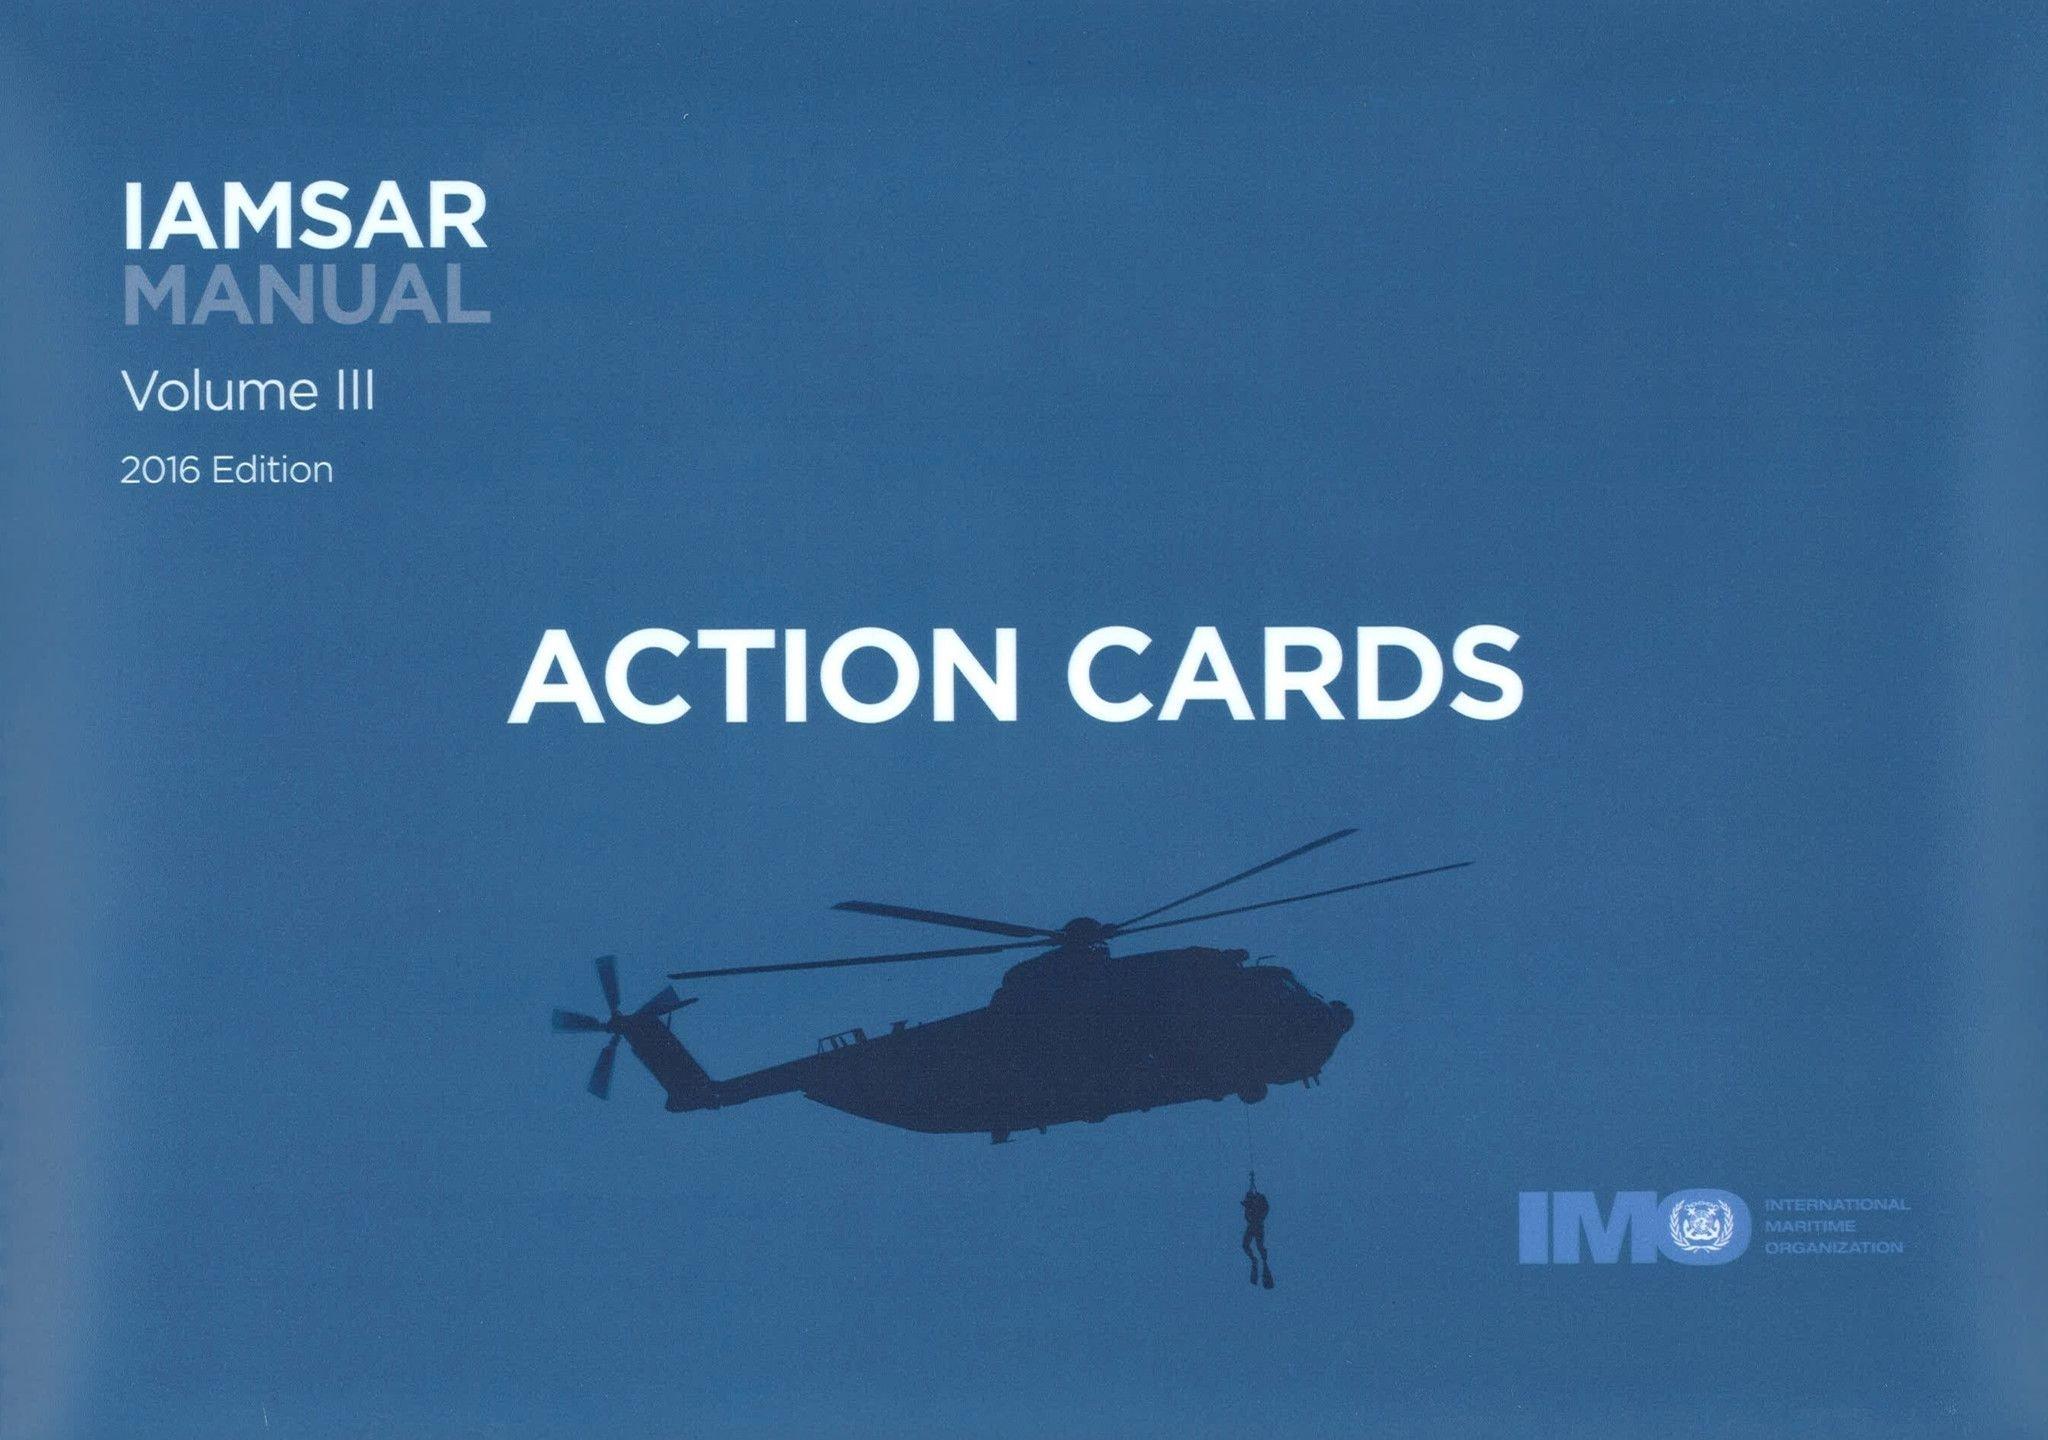 IAMSAR manual: Vol. 3: Action cards: International Maritime Organization:  9789280116427: Amazon.com: Books